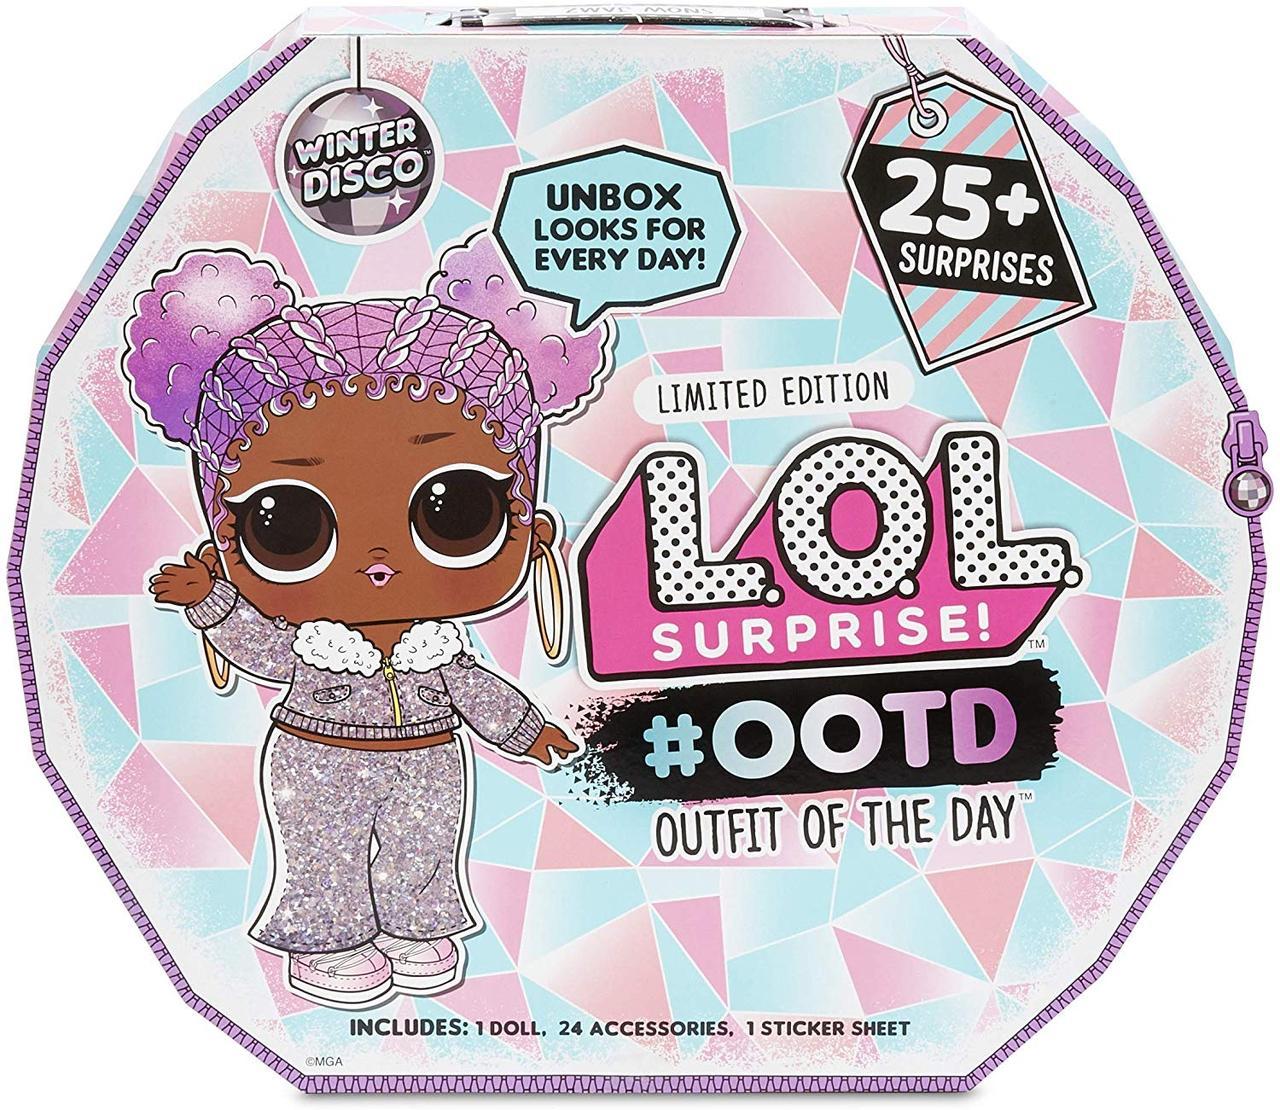 Кукла ЛОЛ Адвент календарь Зимнее диско 25+ сюрприз L.O.L. Surprise! Winter Disco